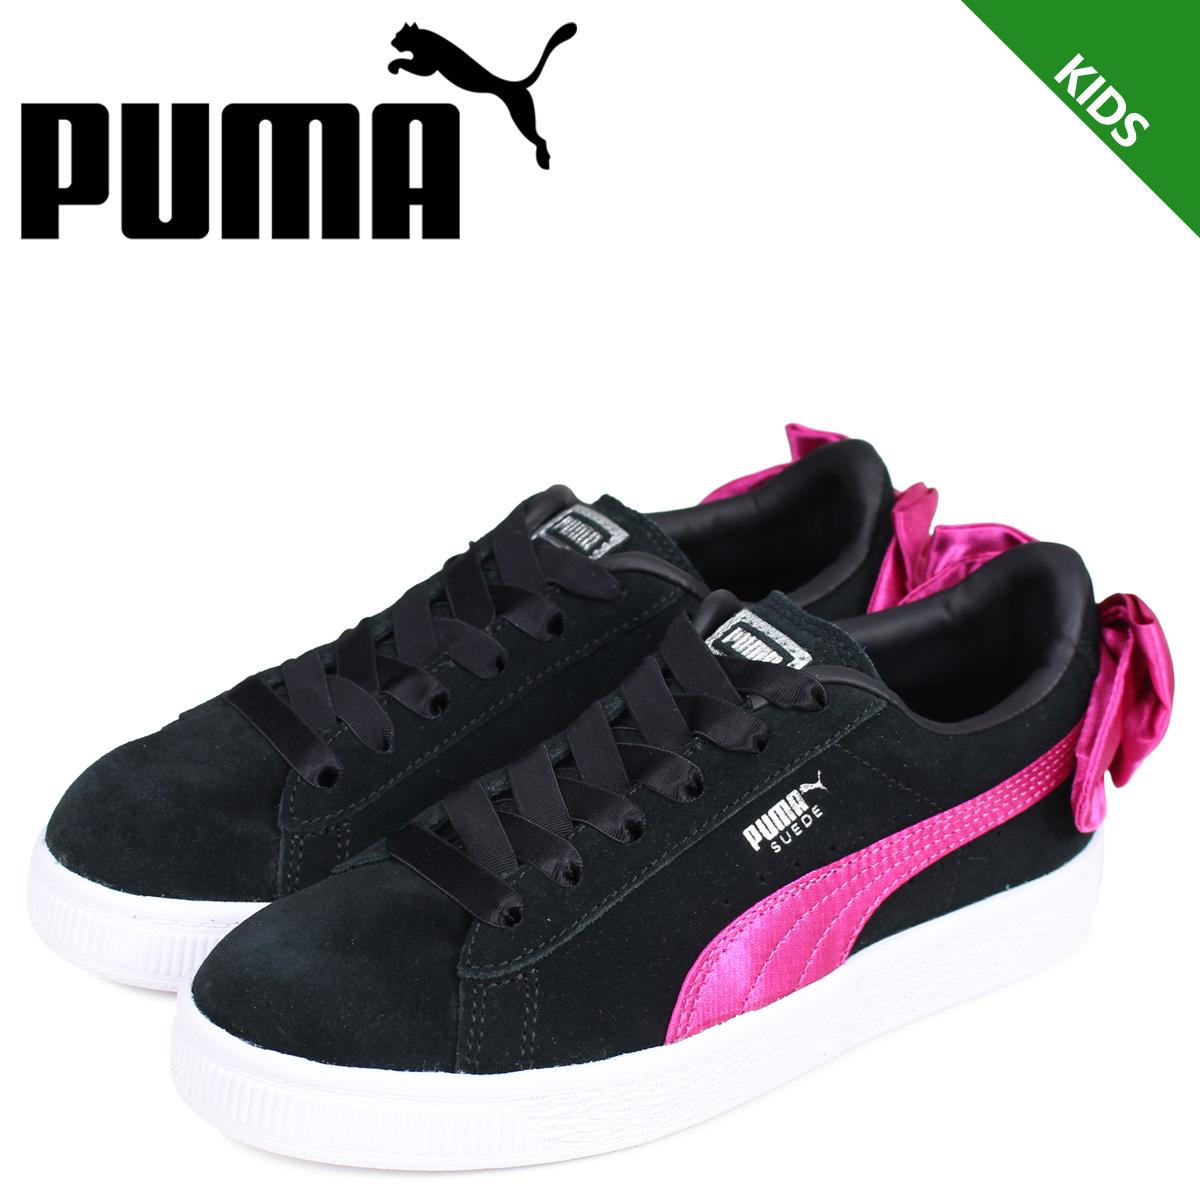 PUMA Puma suede bow tie sneakers kids SUEDE BOW AC PS black black 36731804